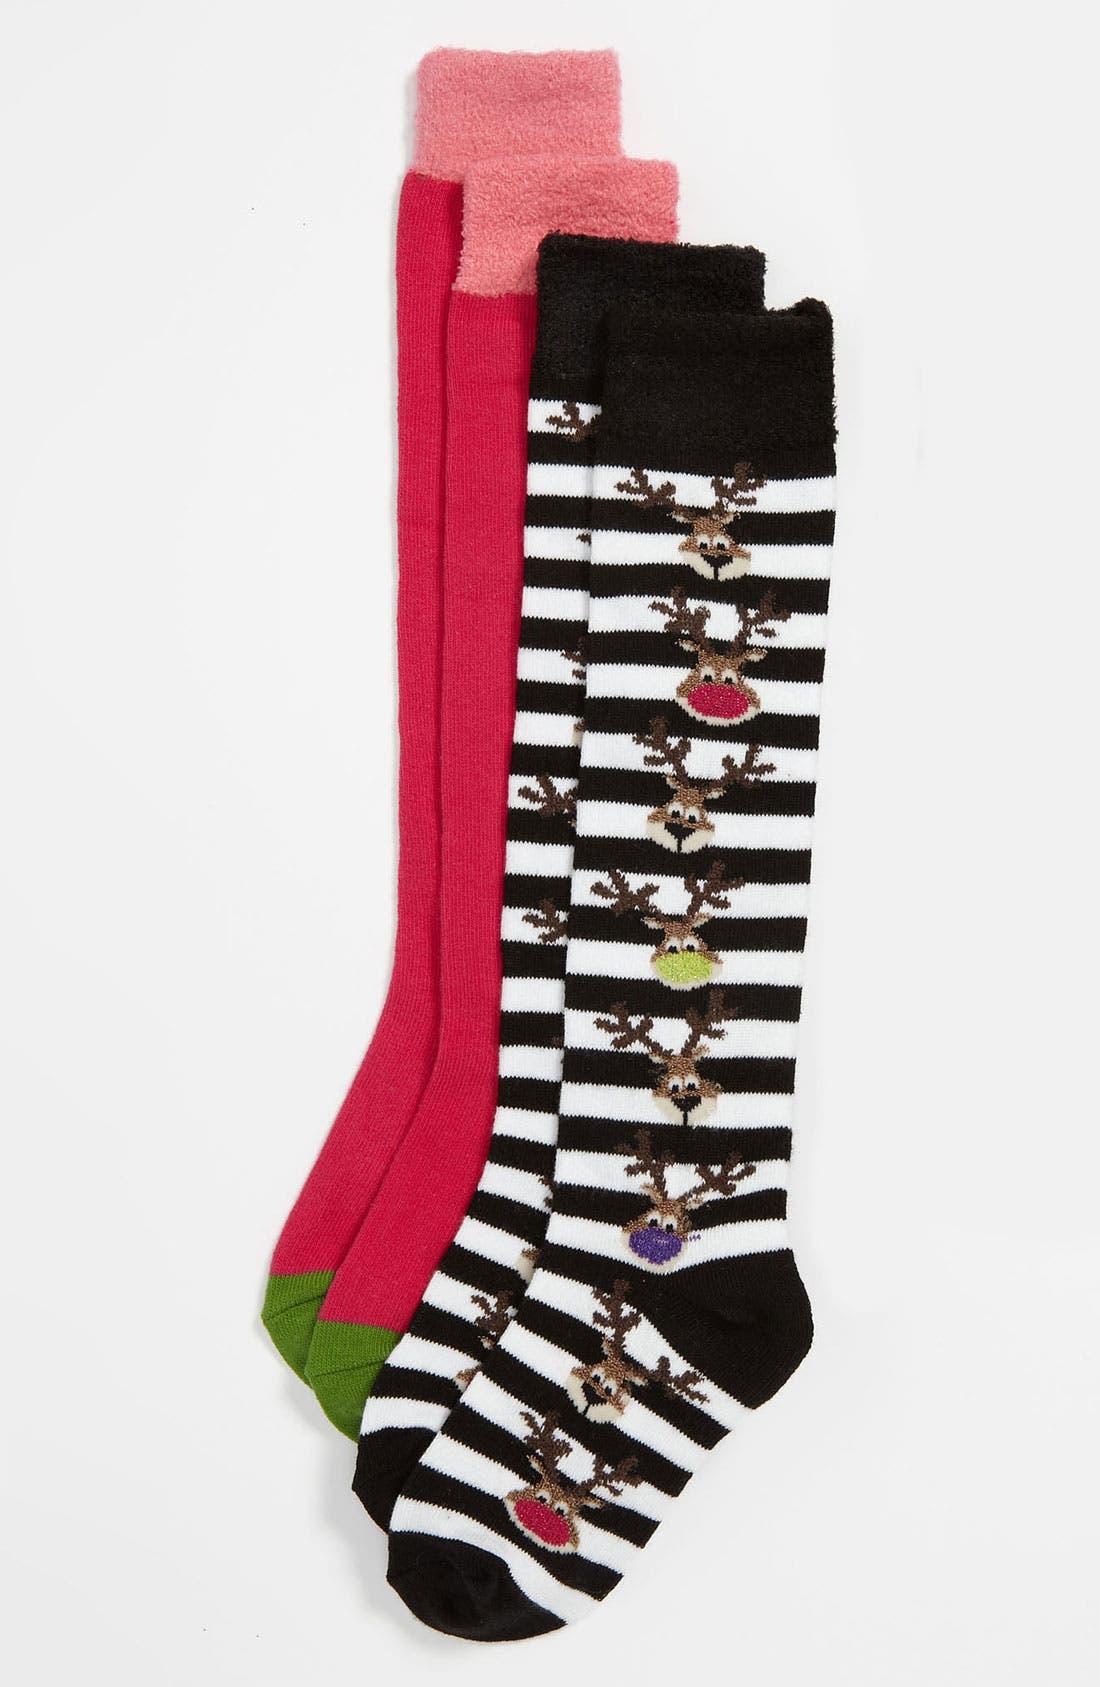 Main Image - Nordstrom 'Silly Reindeer' Knee High Socks (2-Pack) (Walker, Toddler, Little Kid & Big Kid)